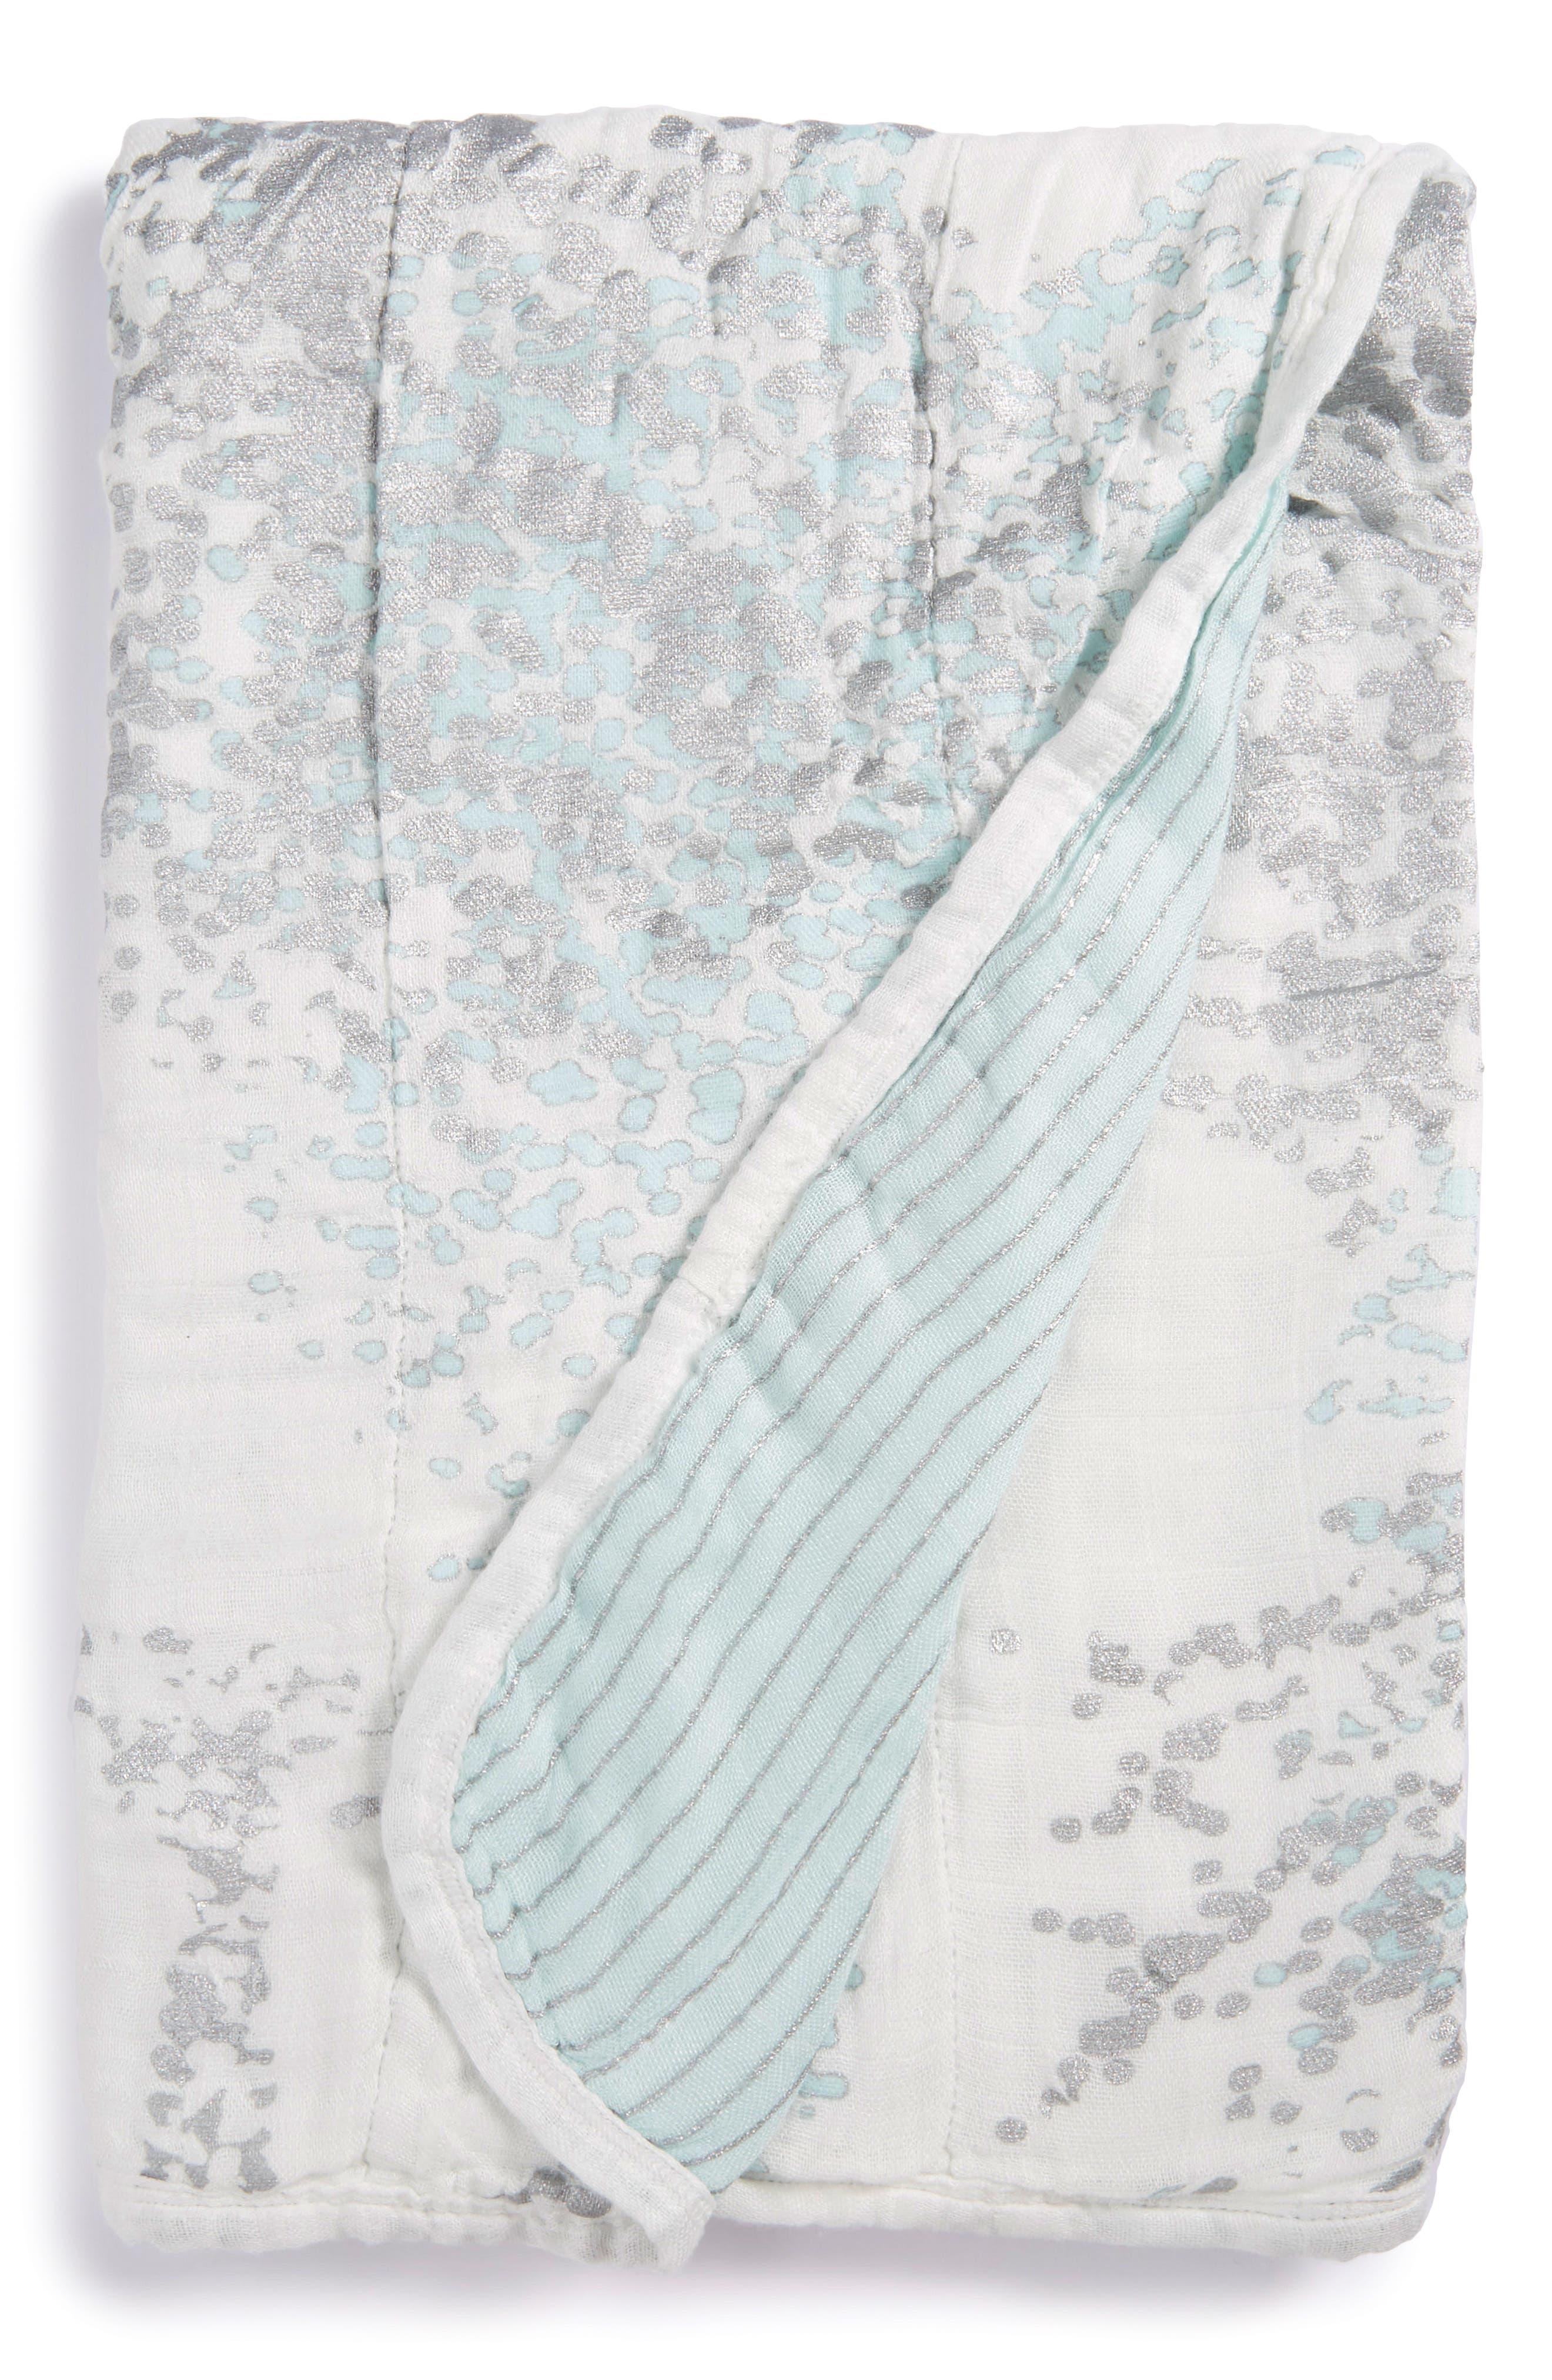 Main Image - aden + anais Silky Soft Stroller Blanket